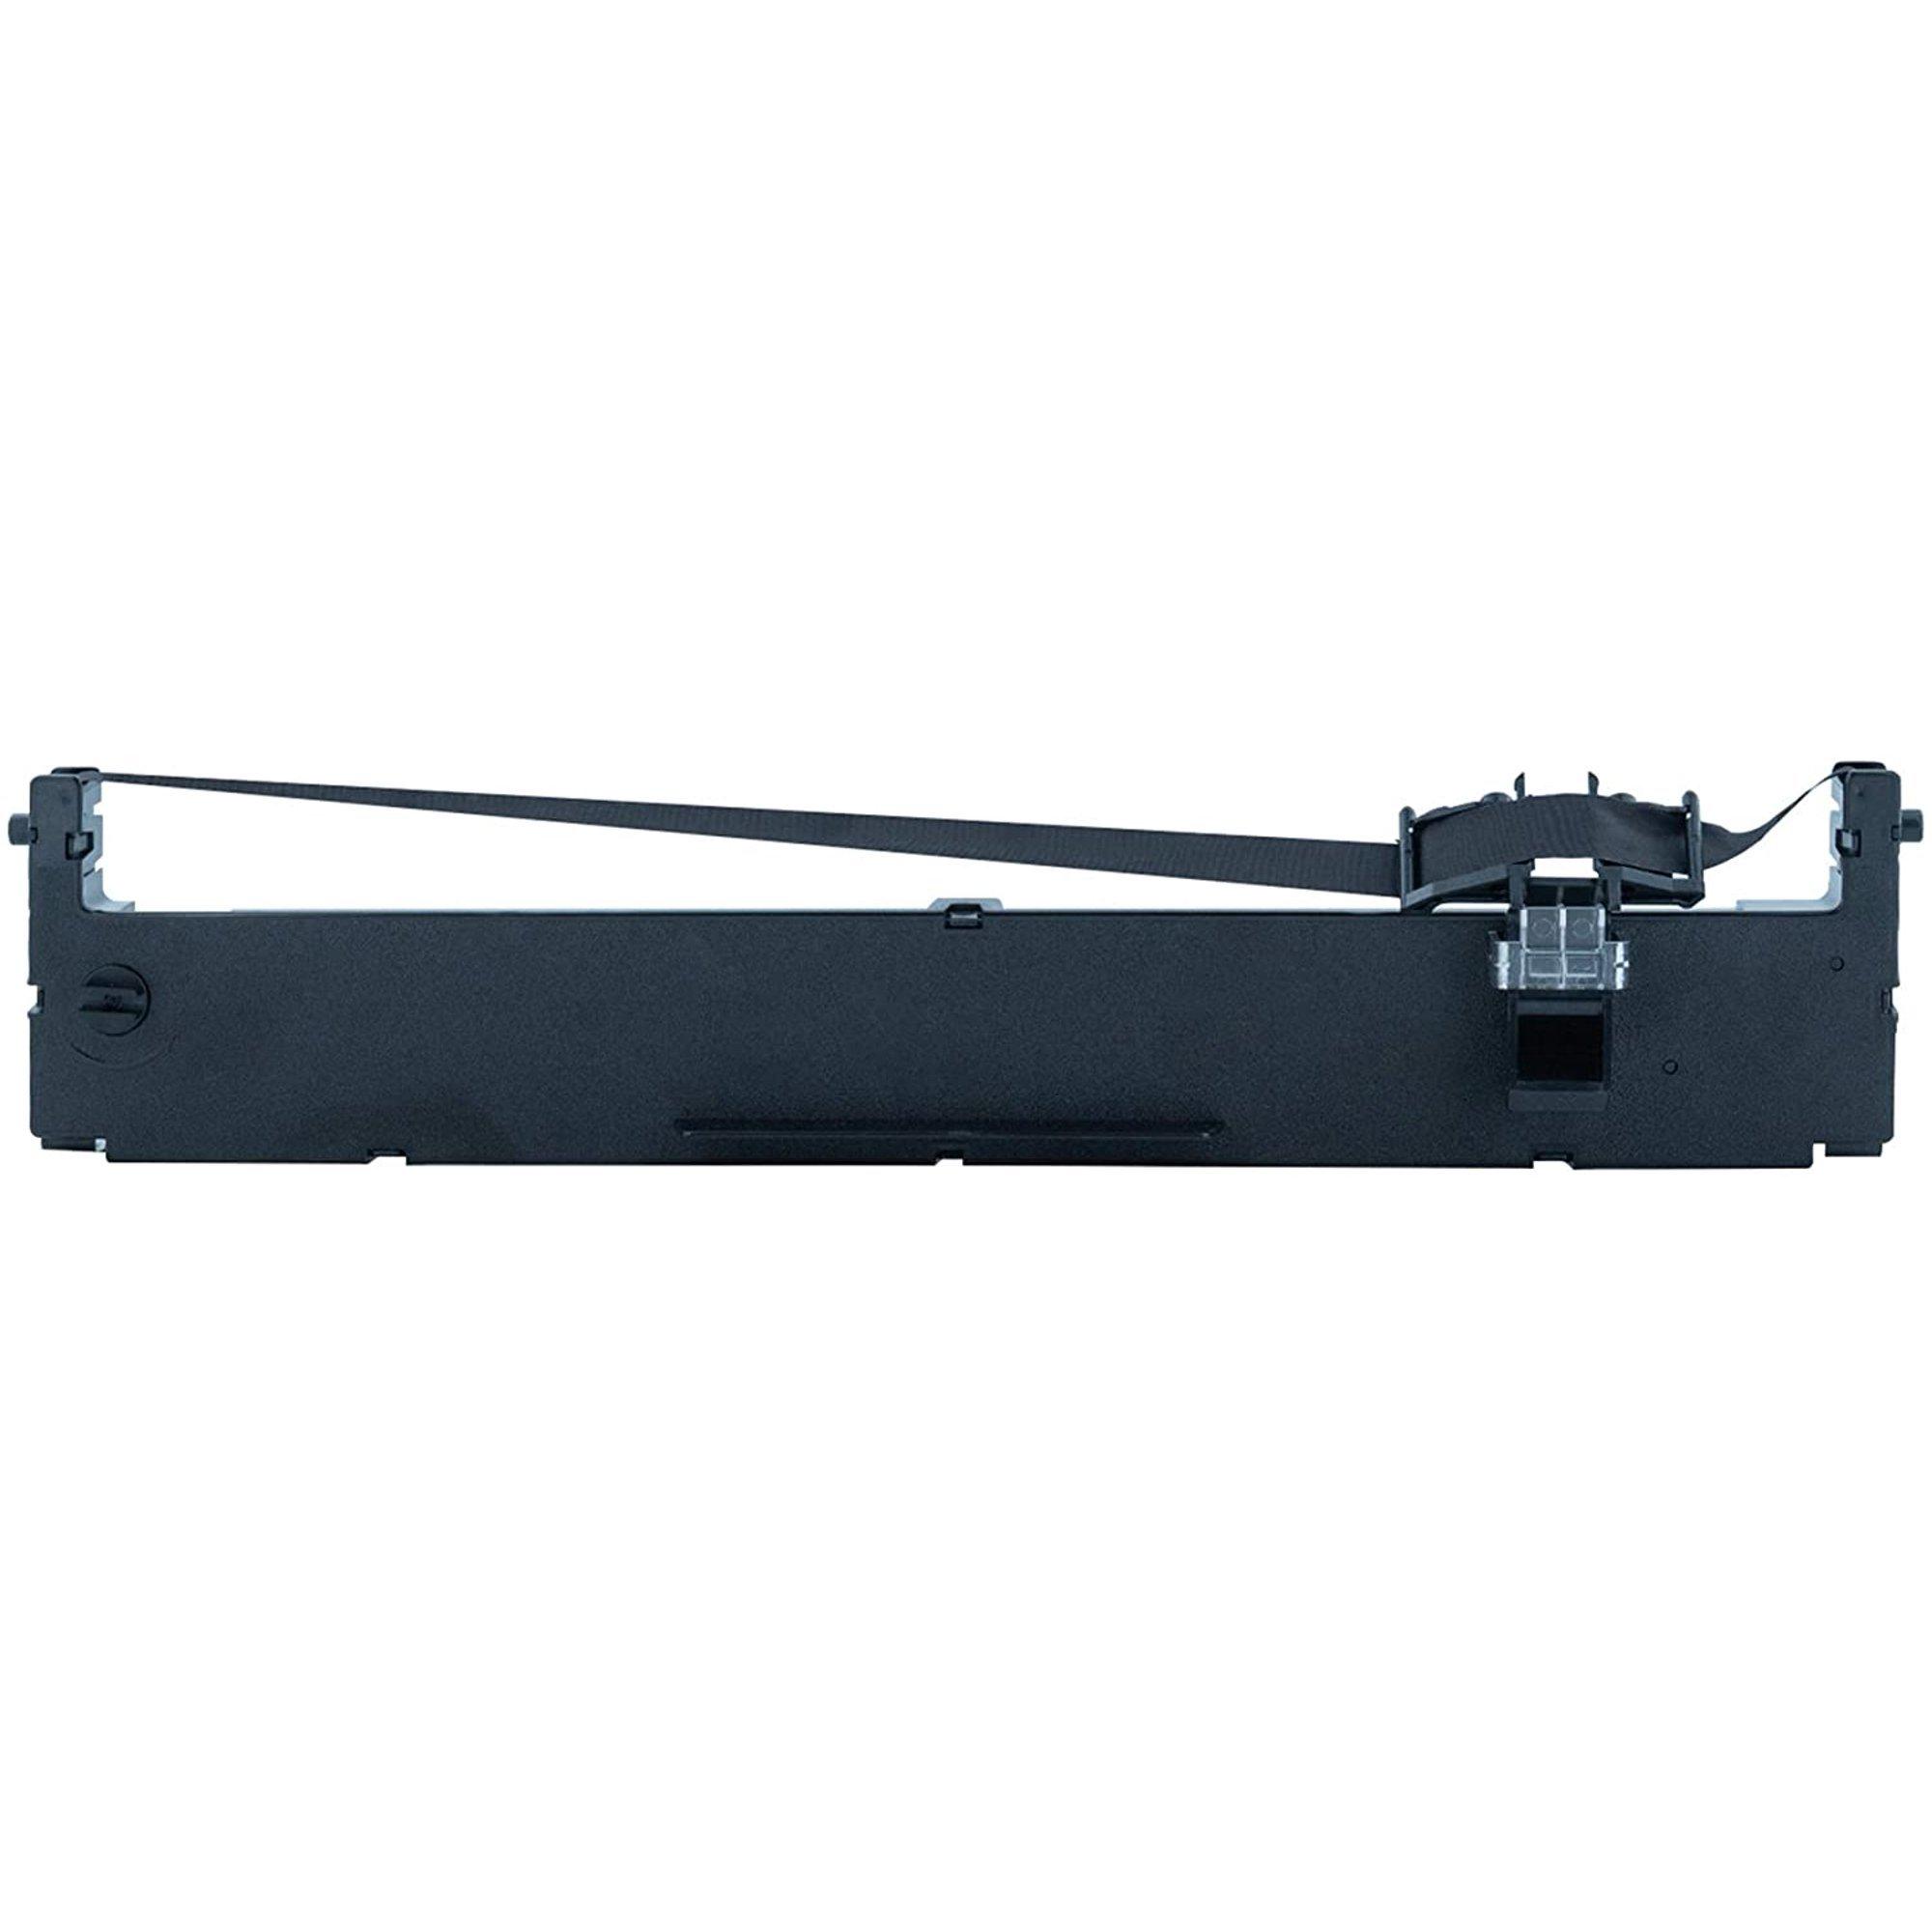 картридж для матричного принтера Star AR1000 / Star LC8021